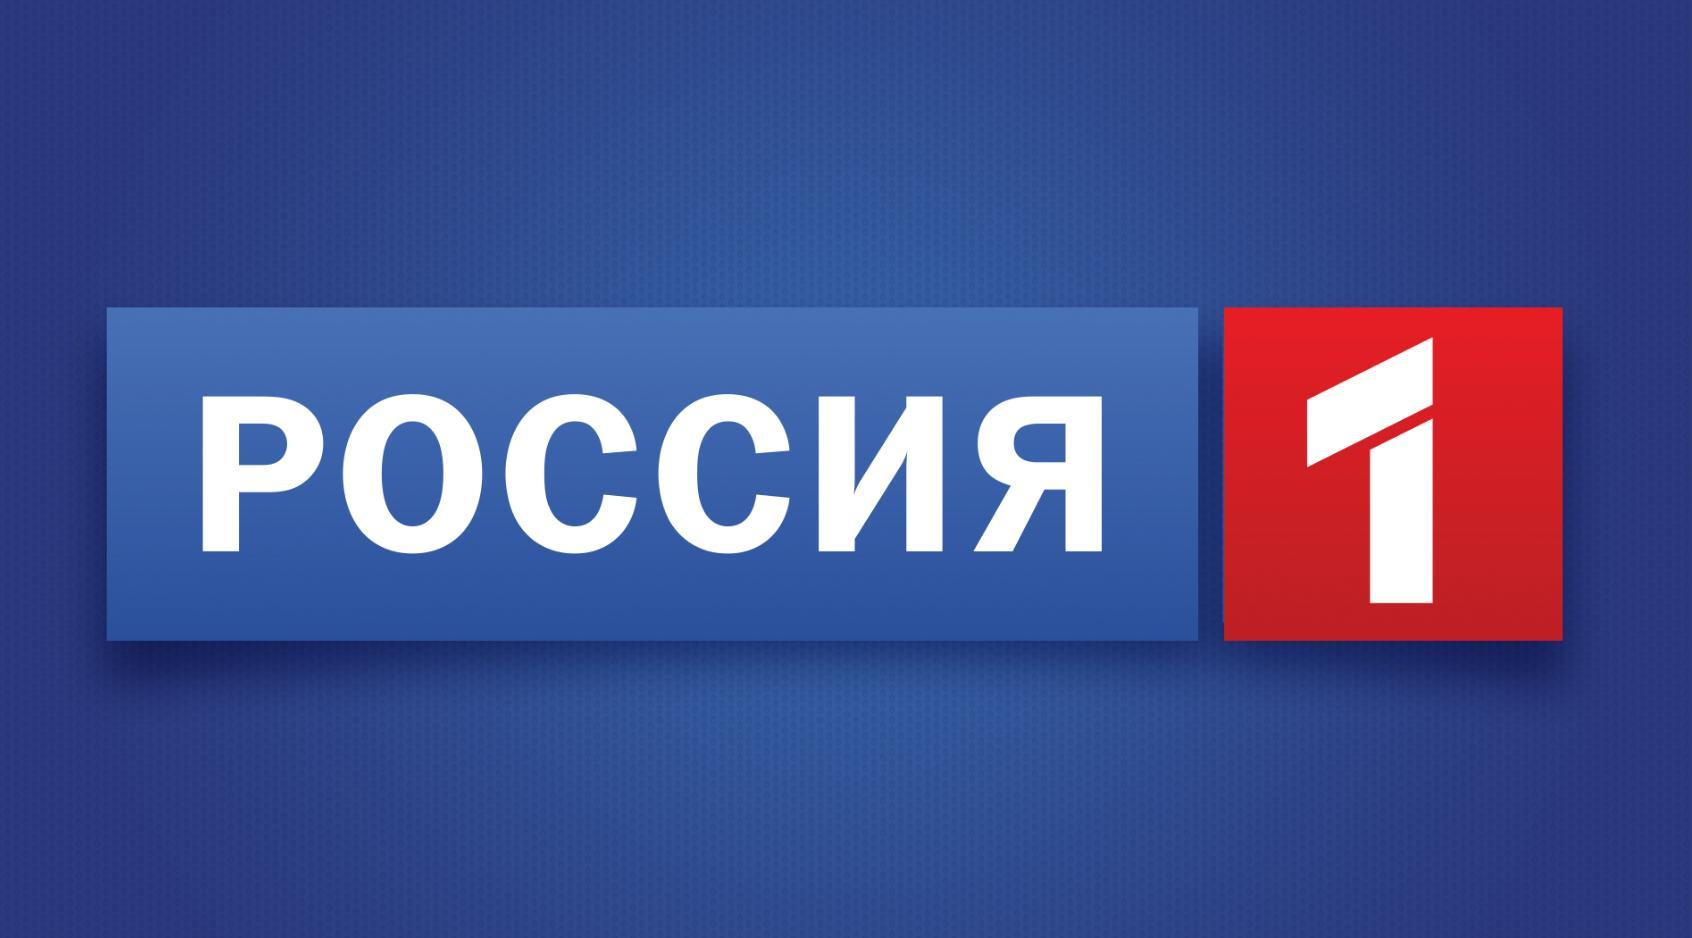 Программа передач россия 1 на сегодня уфа